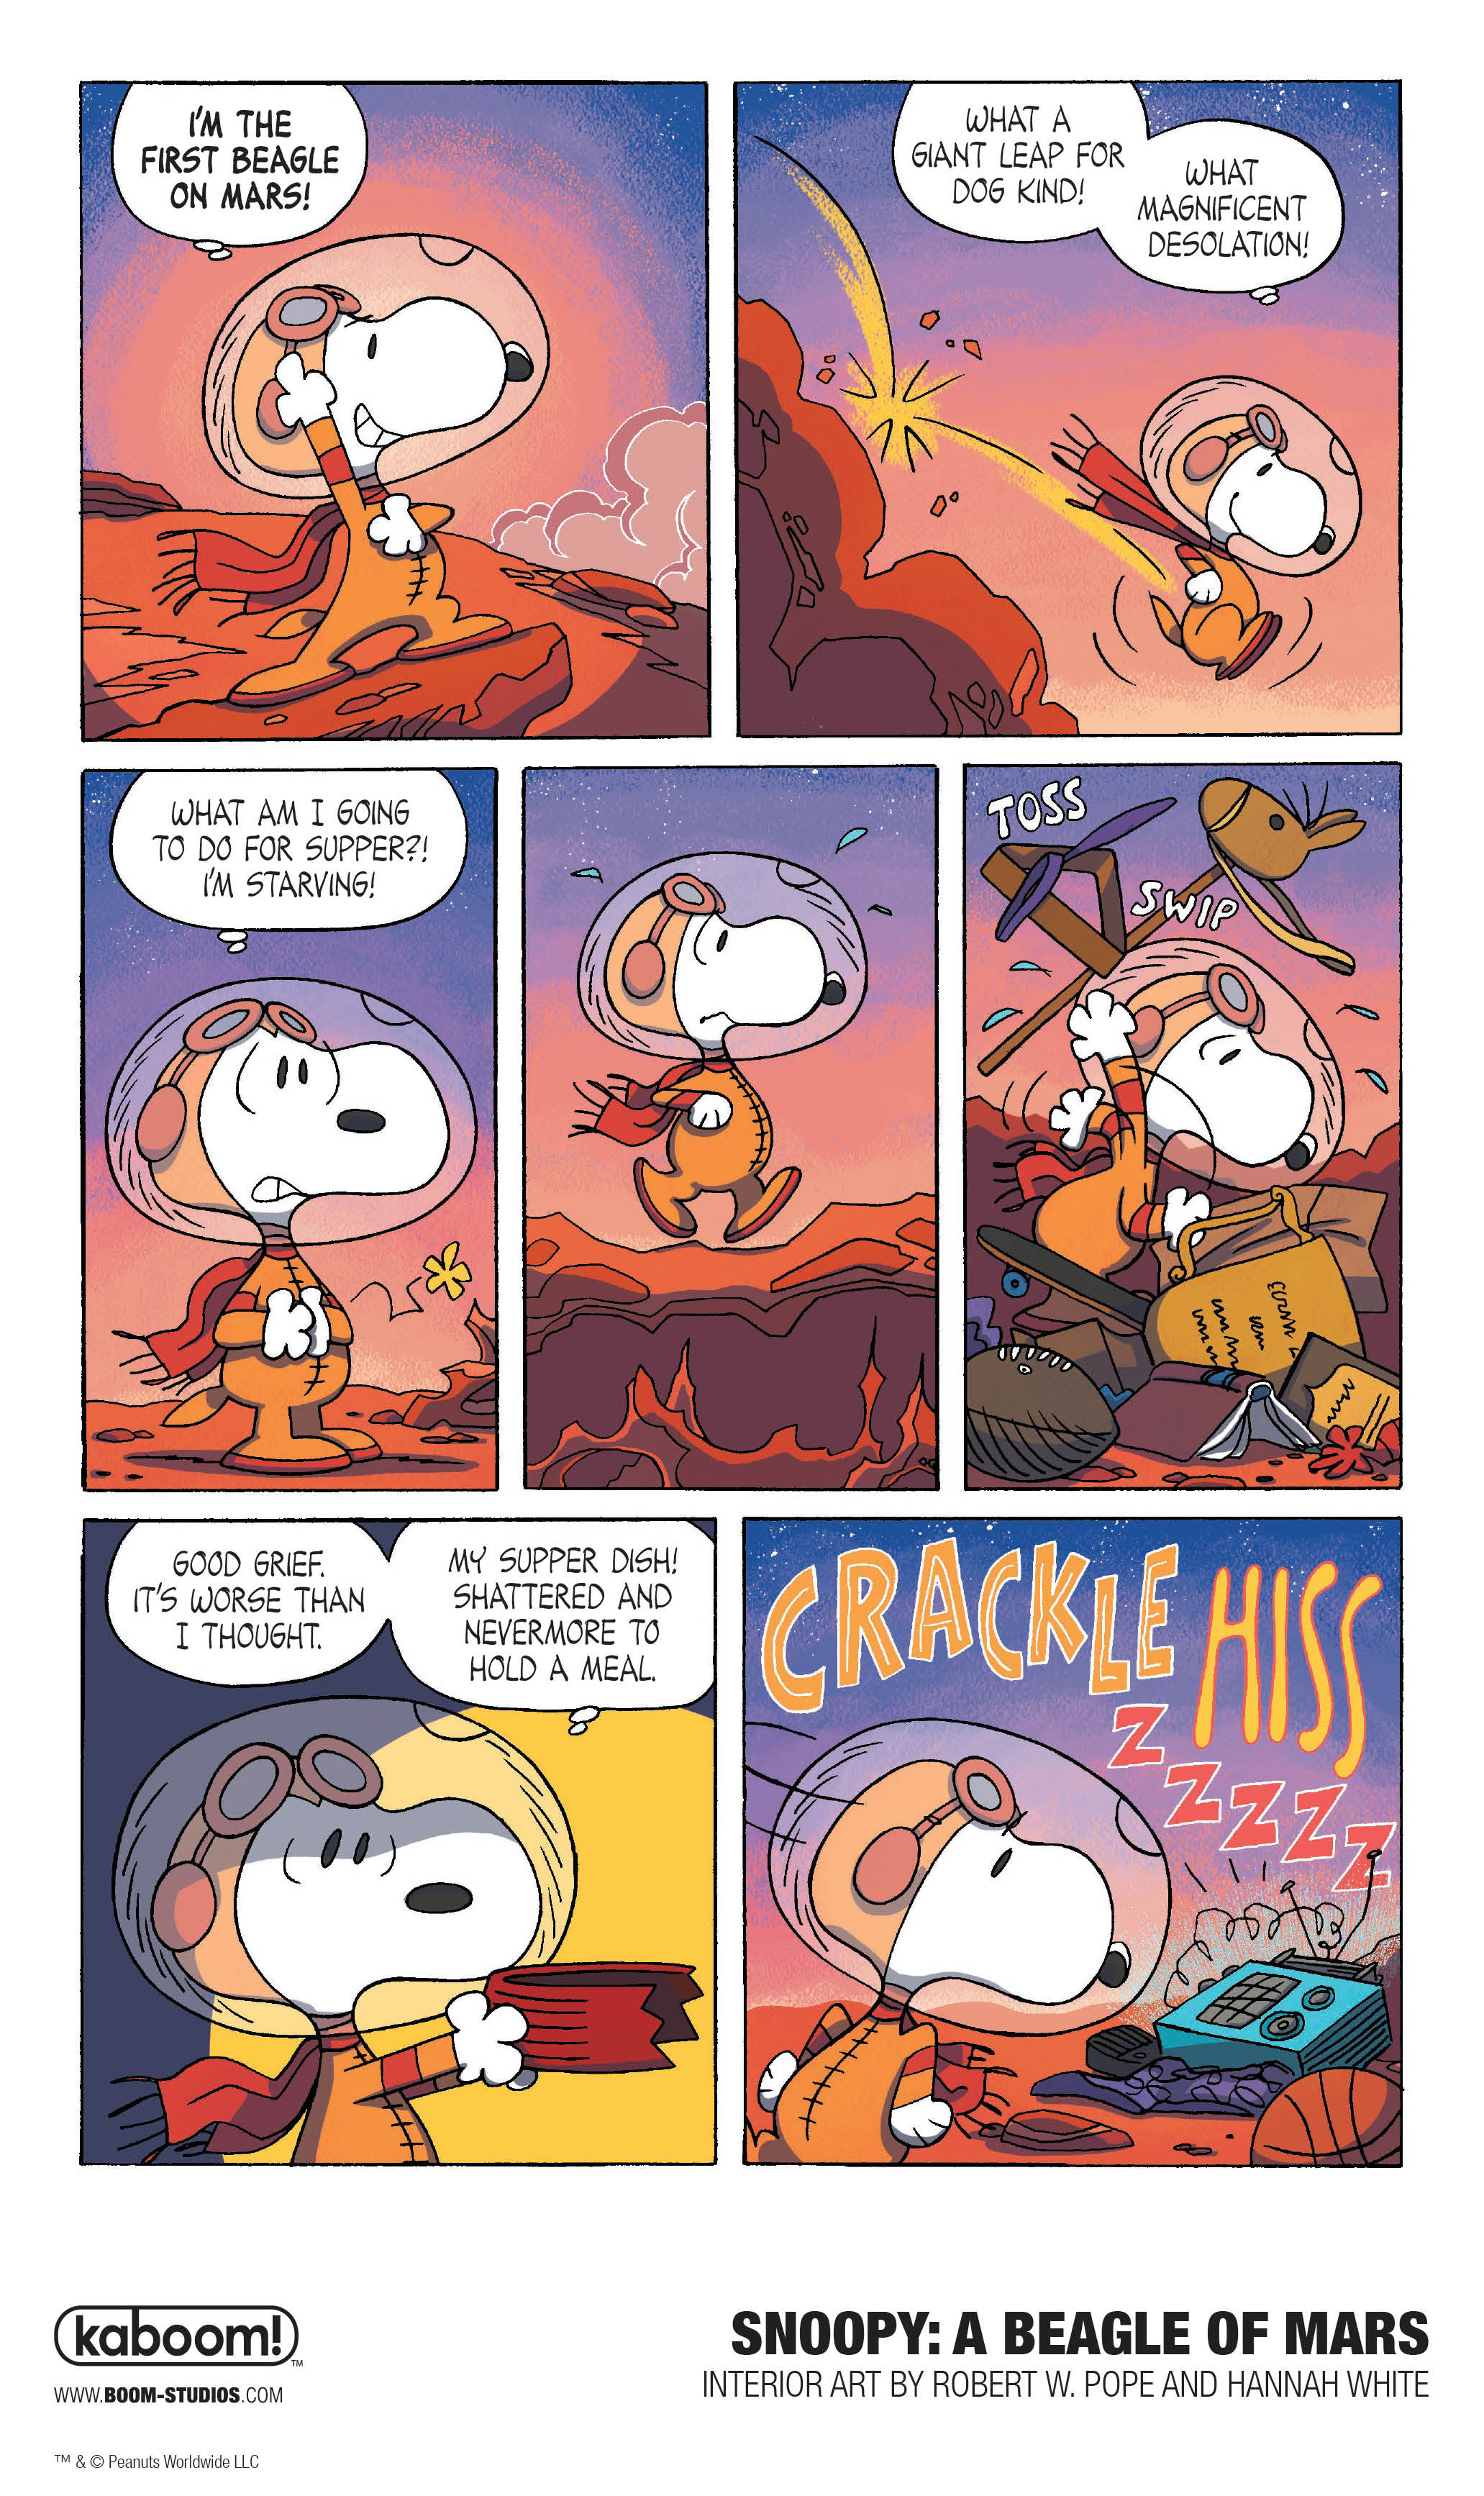 Snoopy: A Beagle of Mars